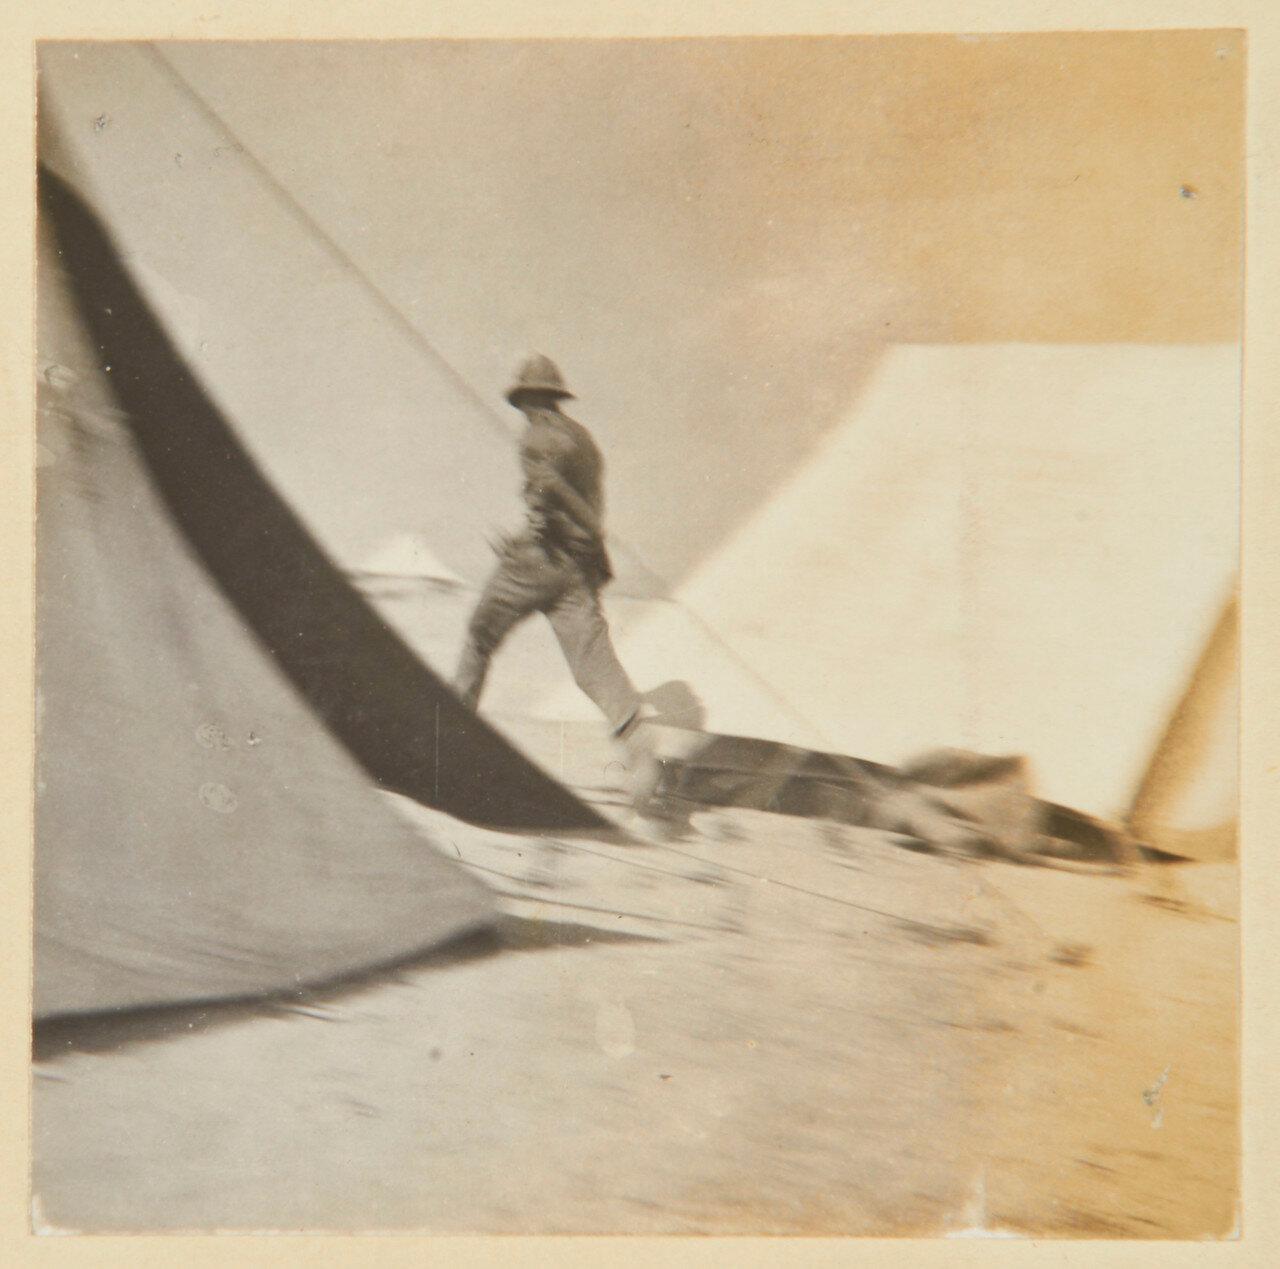 Гренадеры в Сиди Габер возле Александрии. Полет лейтенанта Эдуарда Дугласа Лоха (1873-1942)